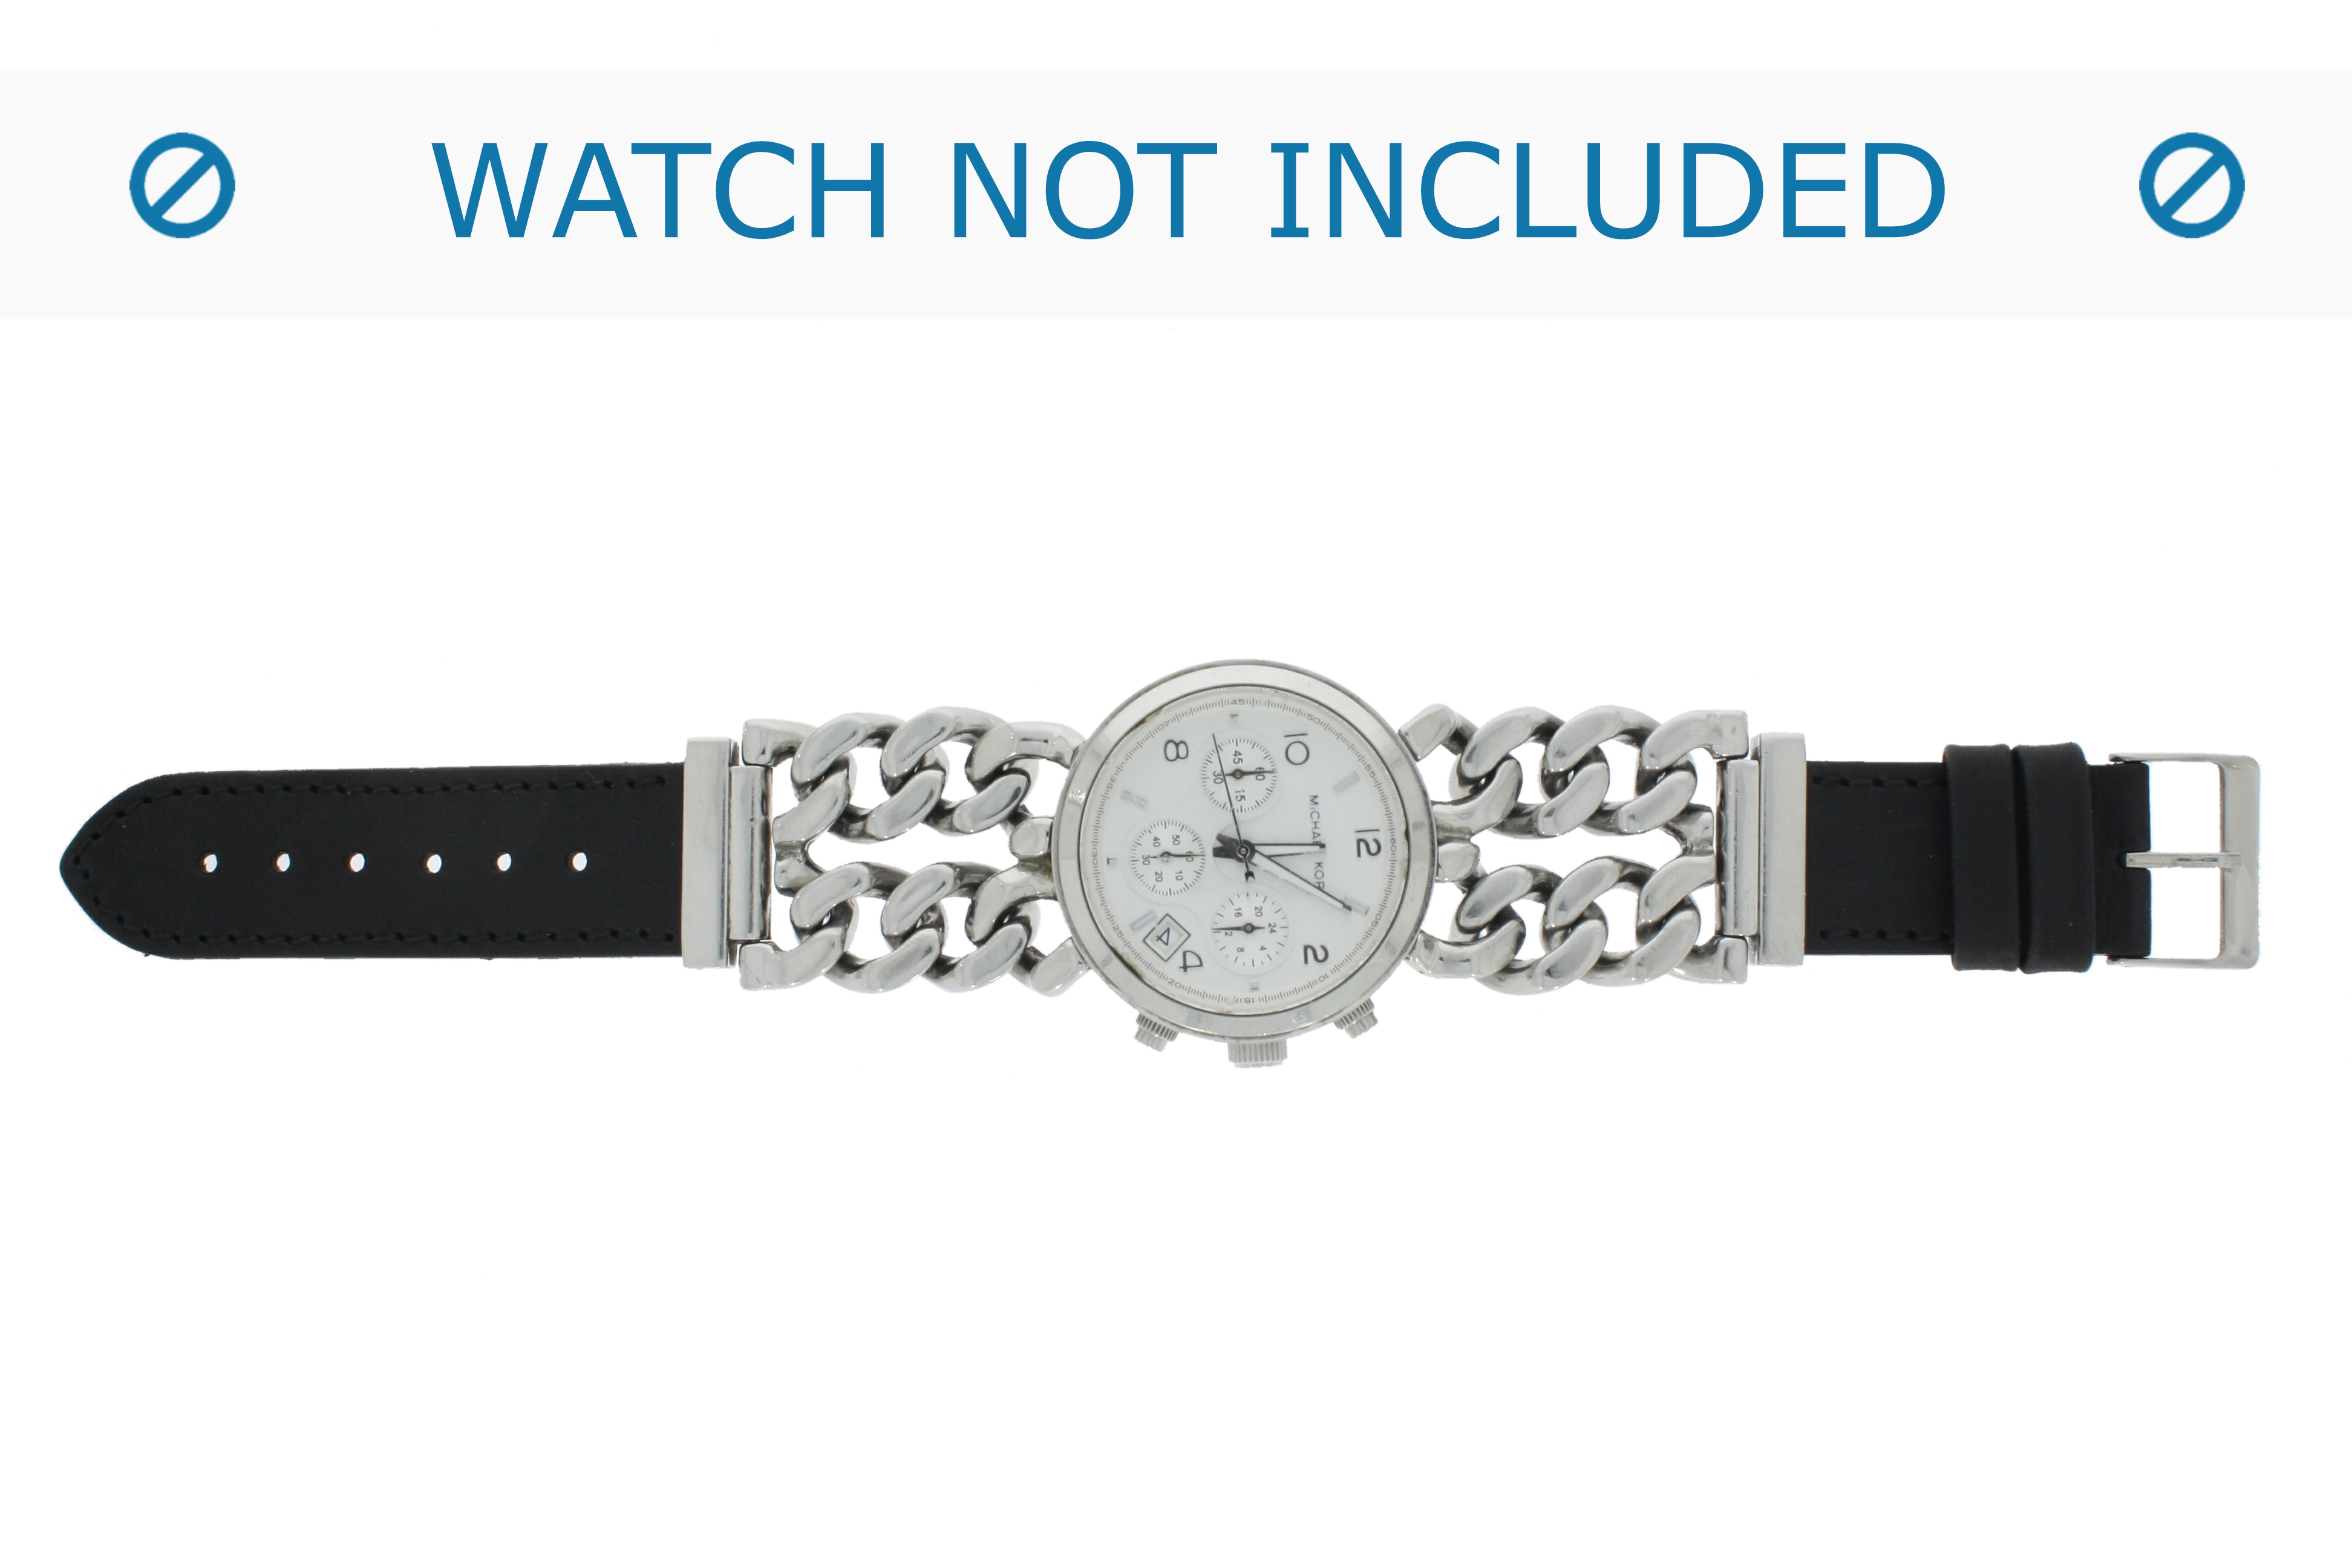 Horlogeband 830.01.20 Short (70x40mm) Leder Zwart 20mm + standaard stiksel